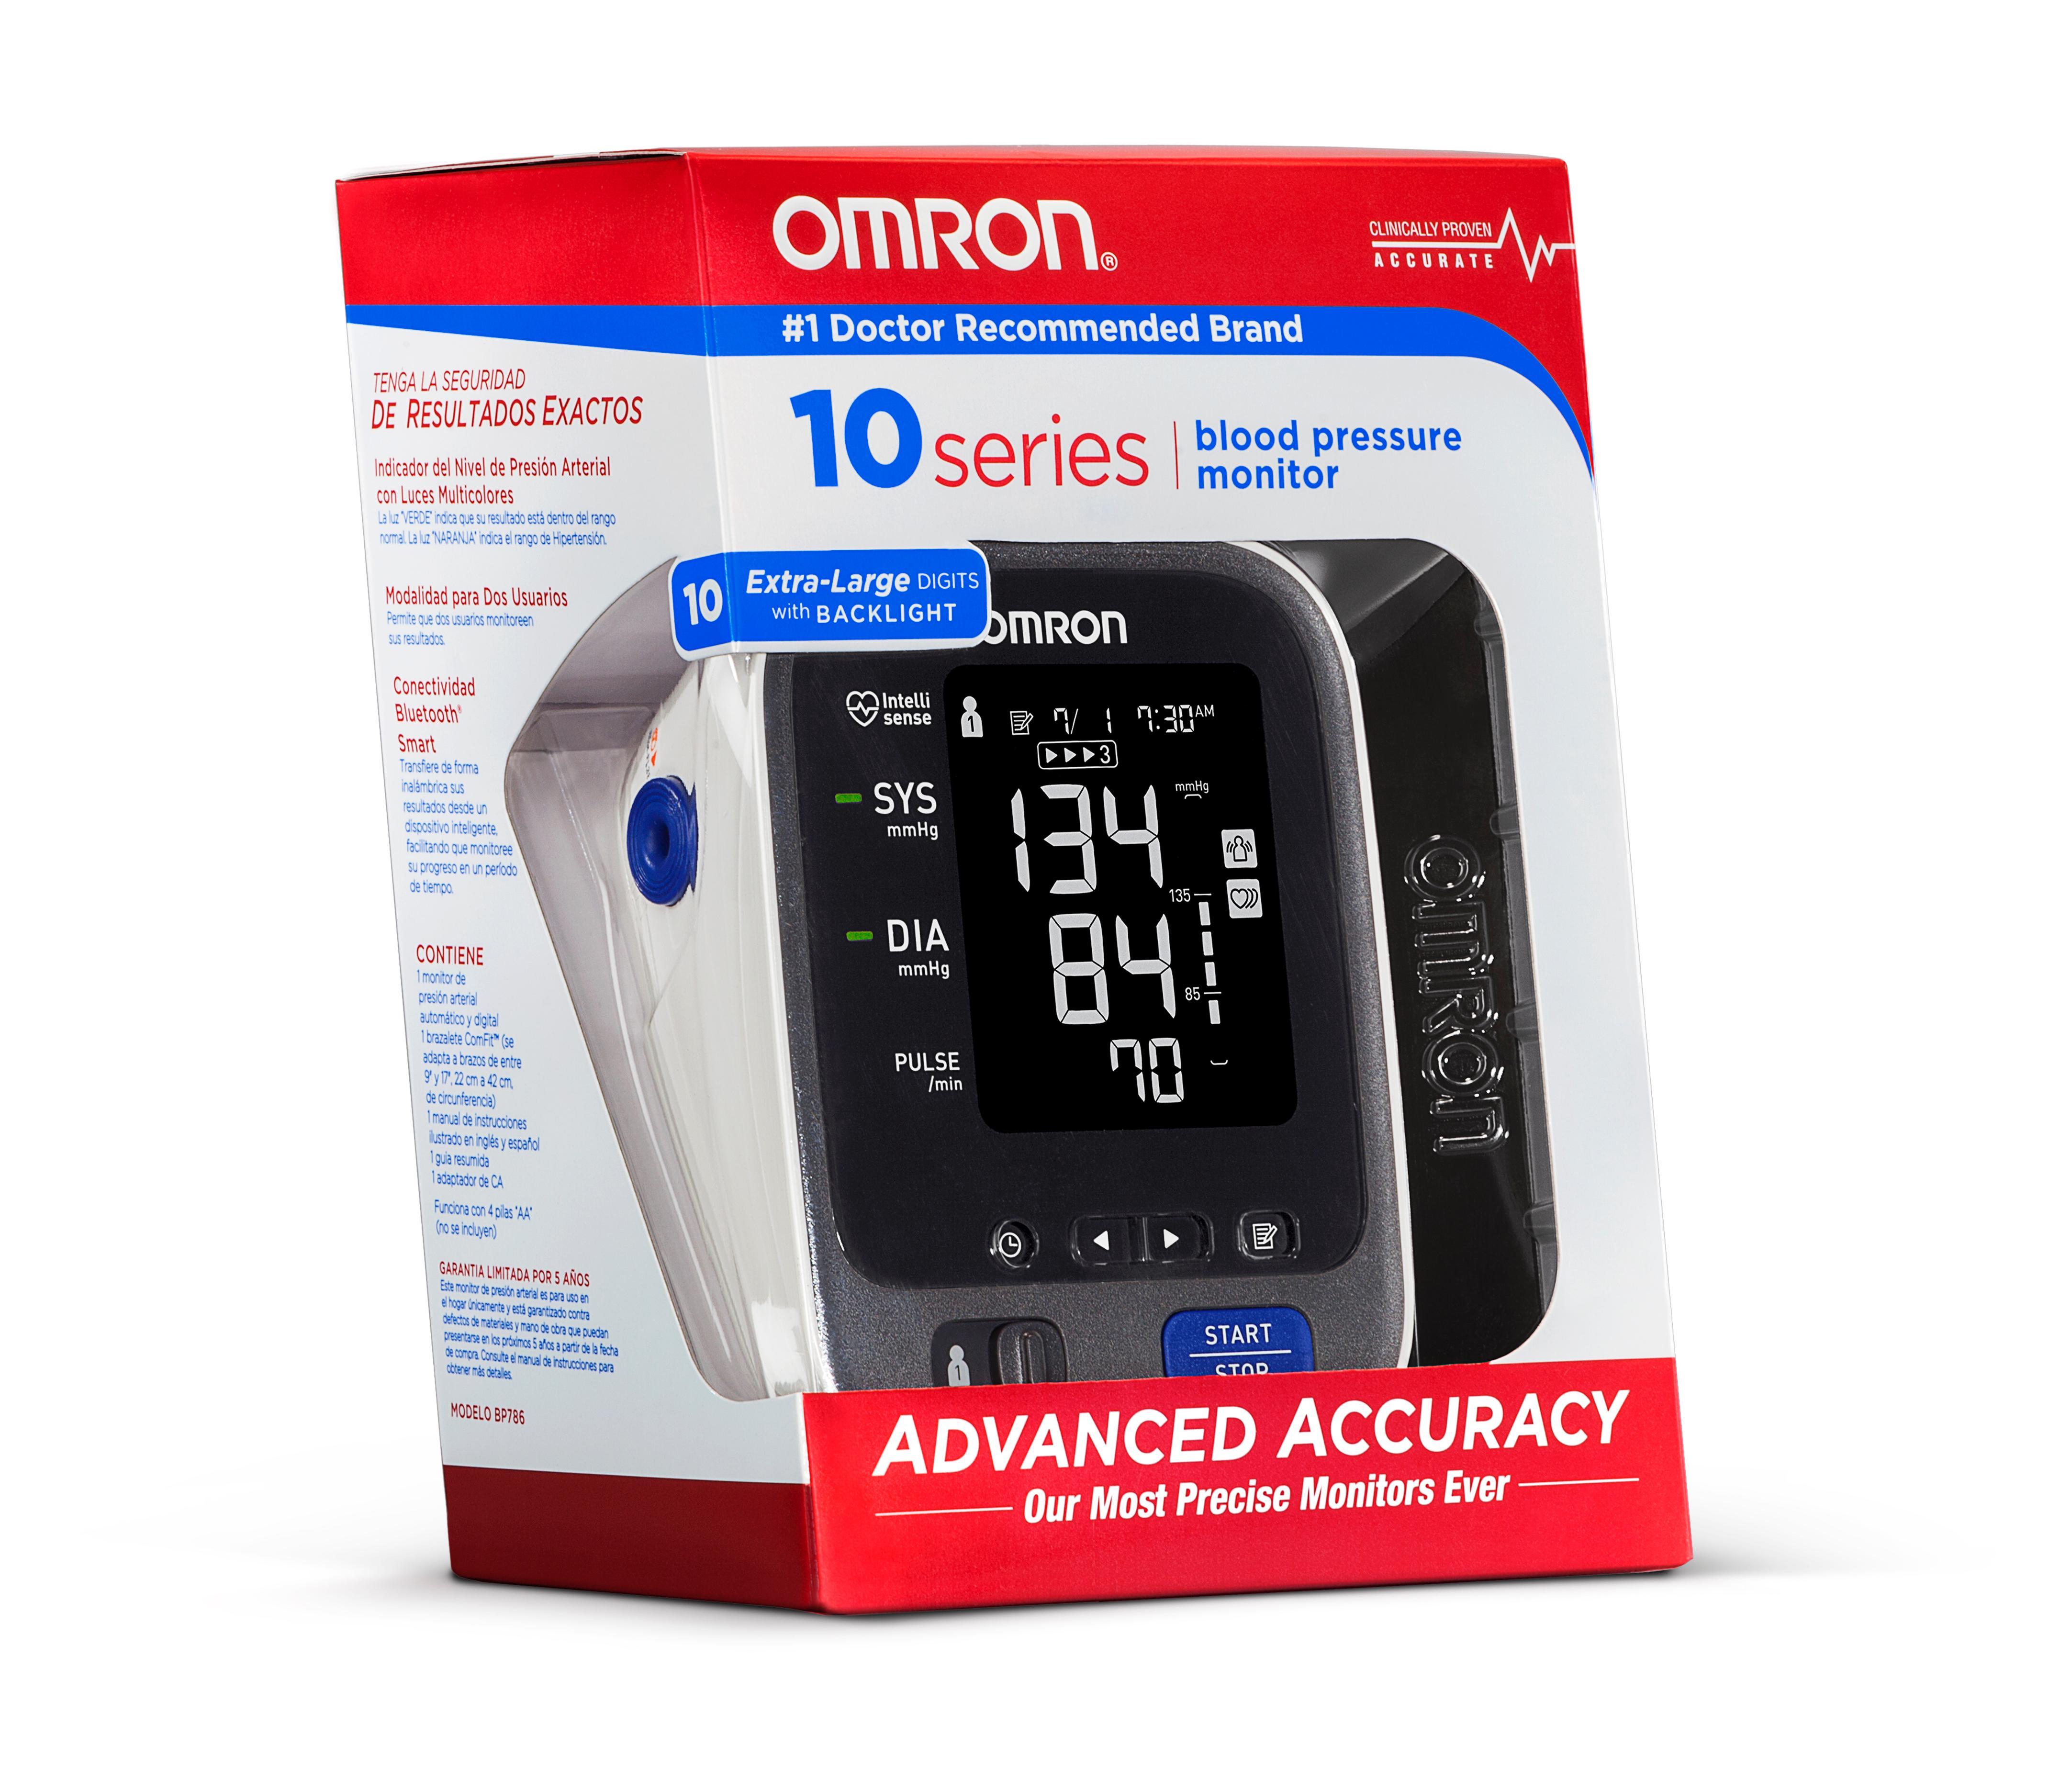 Omron Bp785 10 Series Home Blood Pressure Monitor Manual Guide